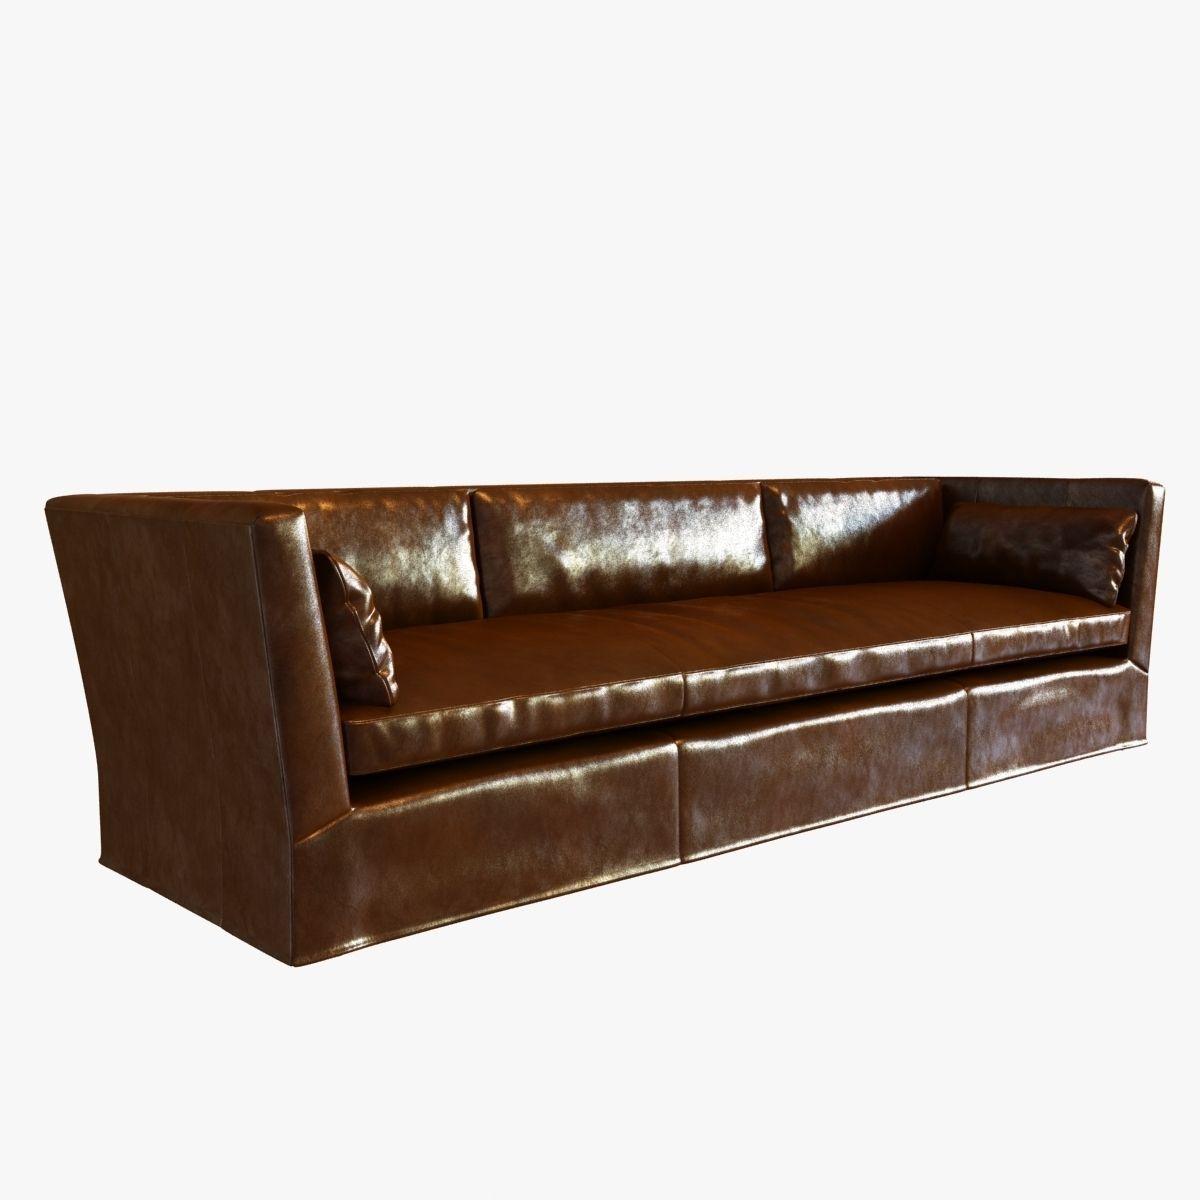 Leather Sofa Repair Rotherham: Restoration Hardware BELGIAN SHELTER ARM L... 3D Model MAX